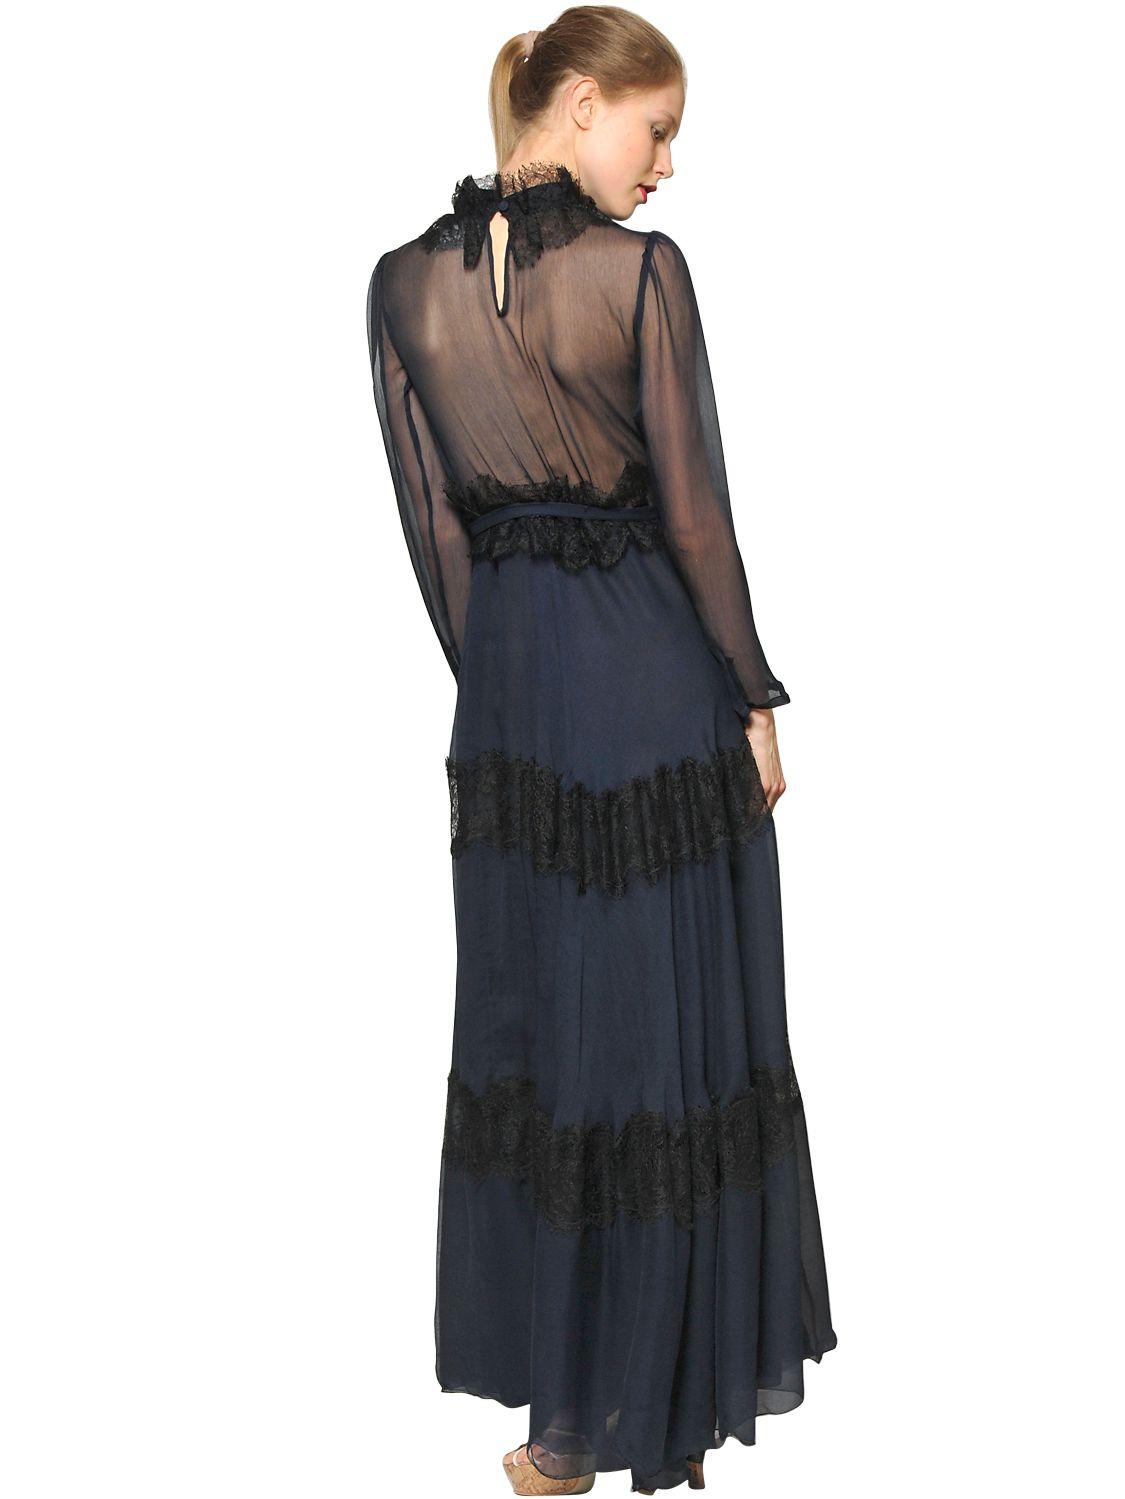 Luisa Beccaria Lace Amp Chiffon Long Dress In Black Lyst